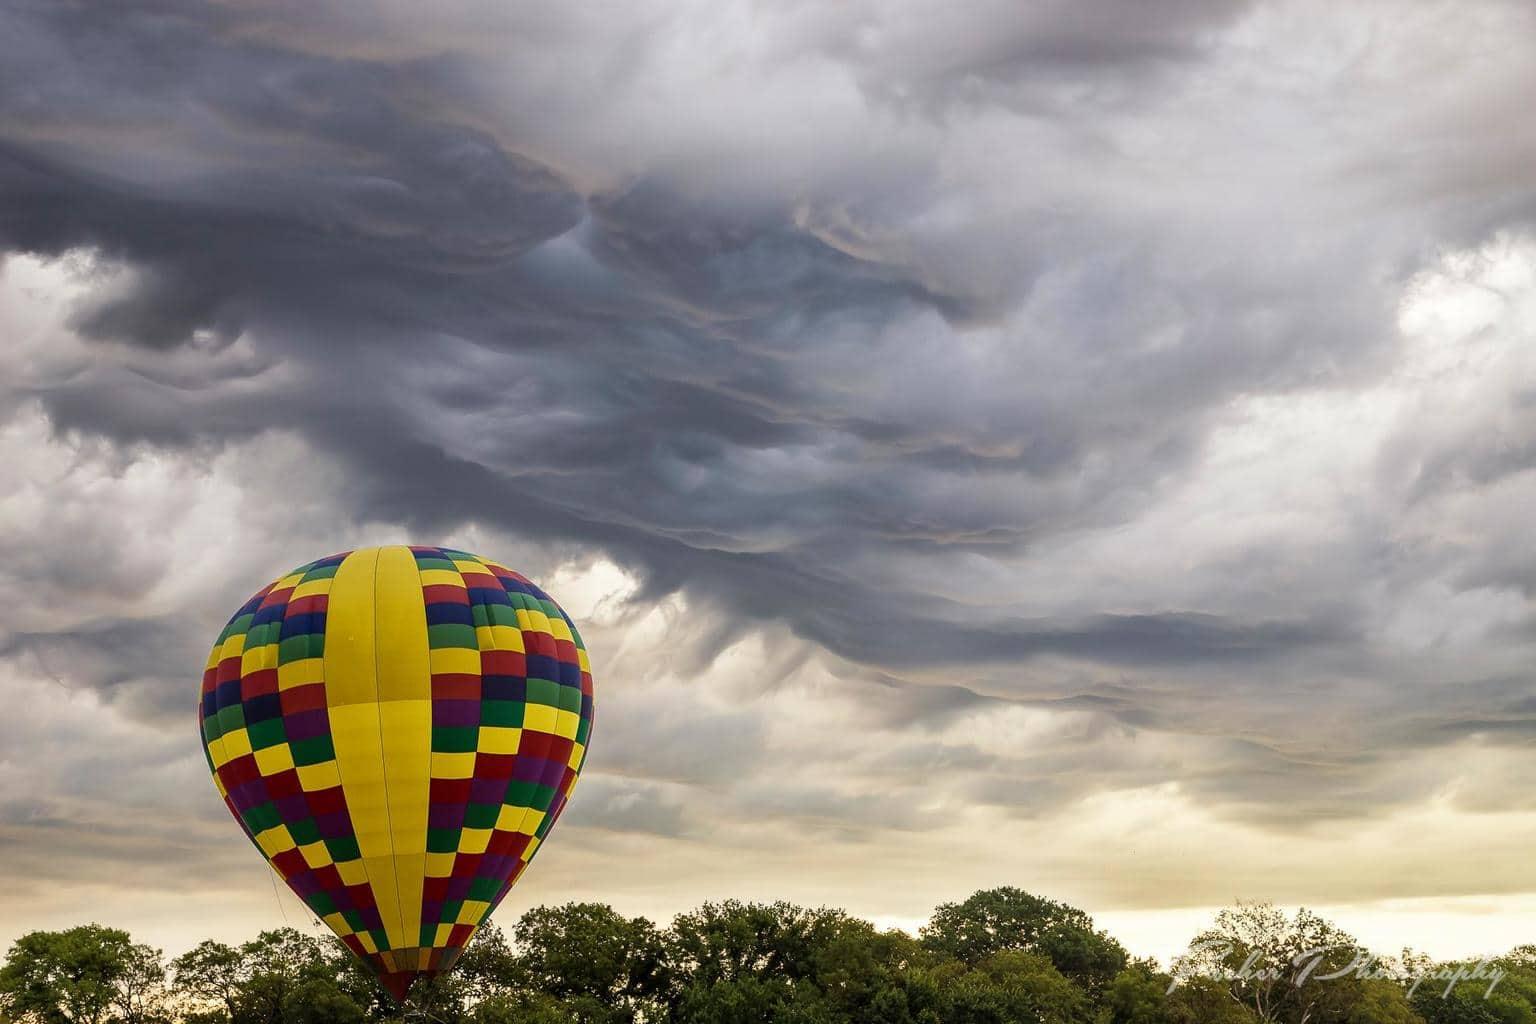 Undulatus Asperatus rolling through the Plano Balloon Festival this past weekend.